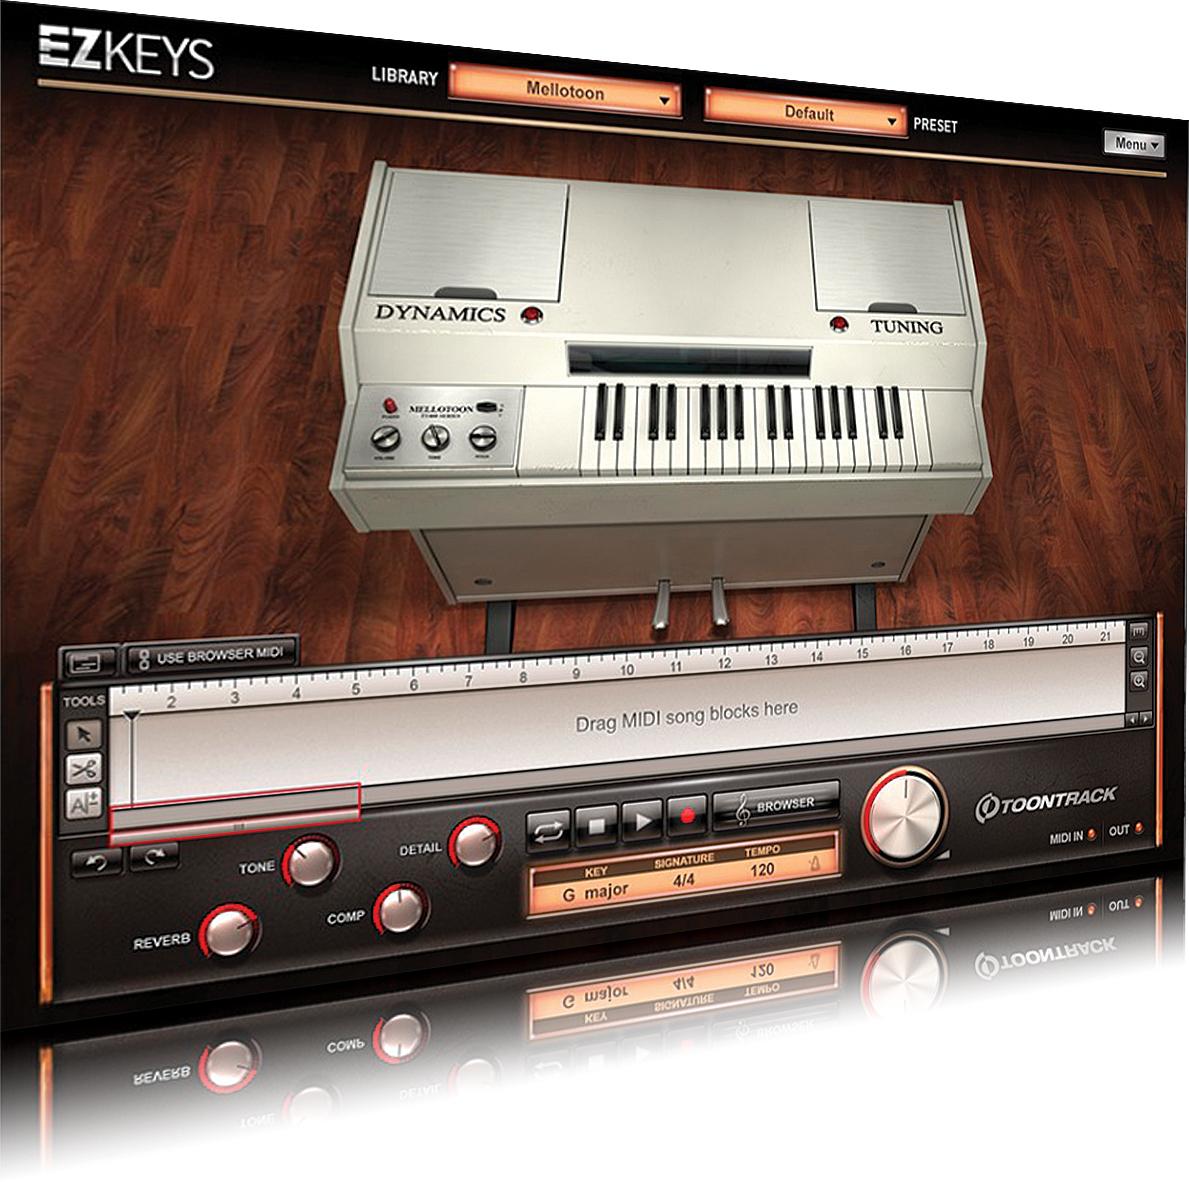 ezkeys studio one